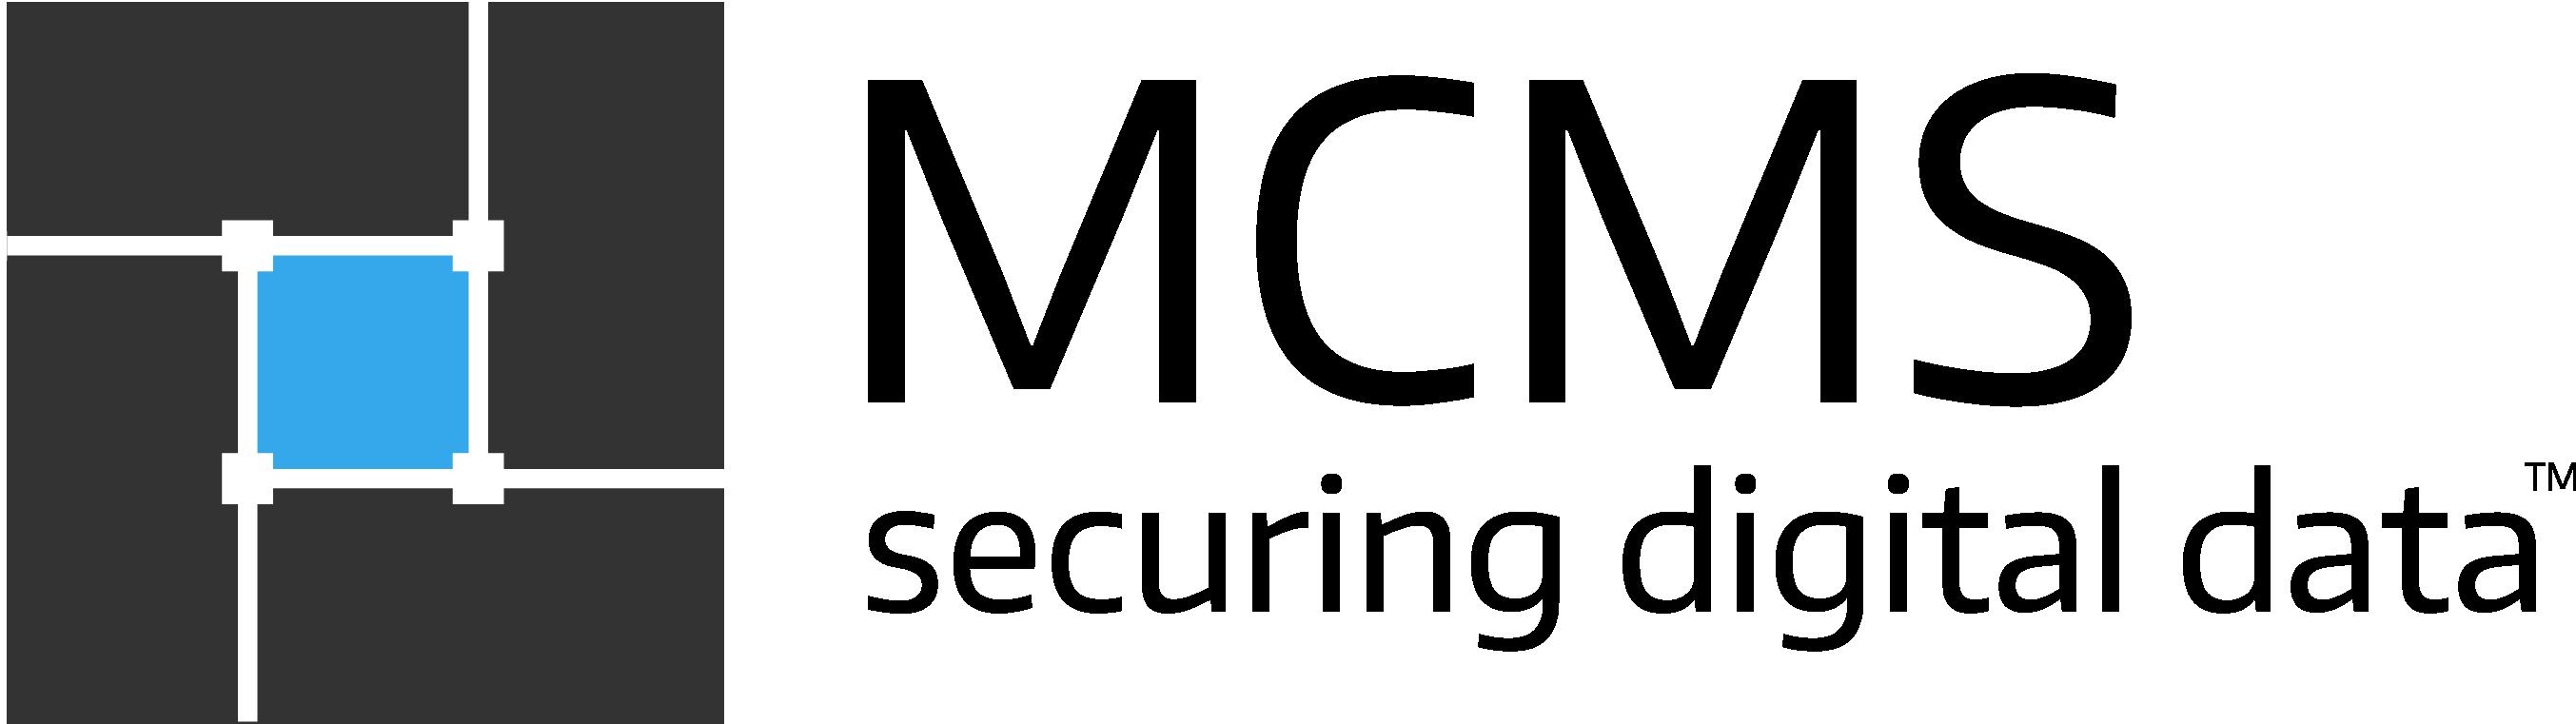 mcms_logo